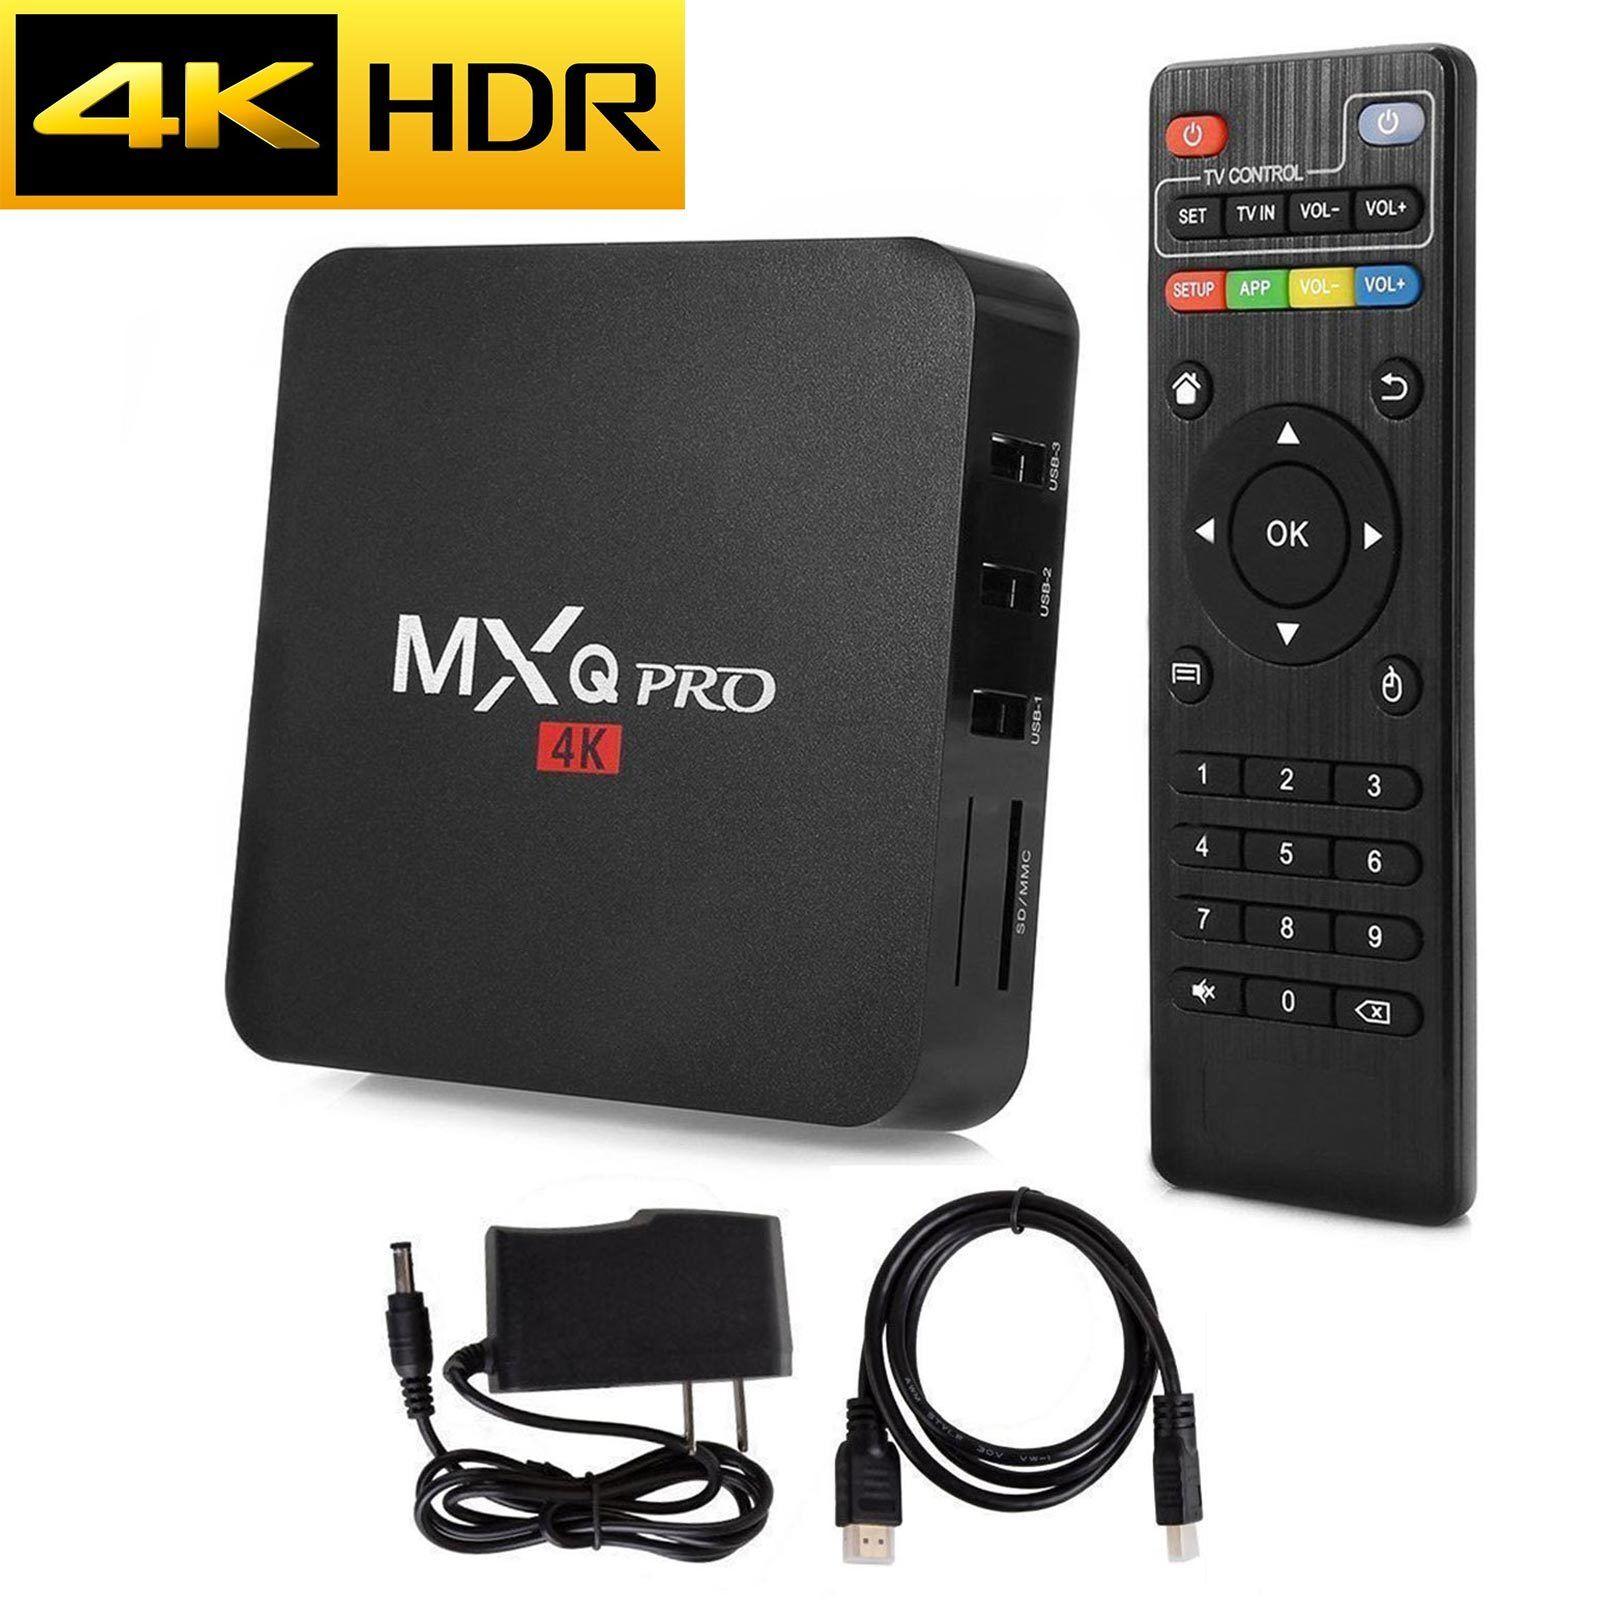 s-l1600 Latest MXQ Pro 4K HDR Android 7.1.2 Nougat TV Box with KODI 18 1G/8G S905W US